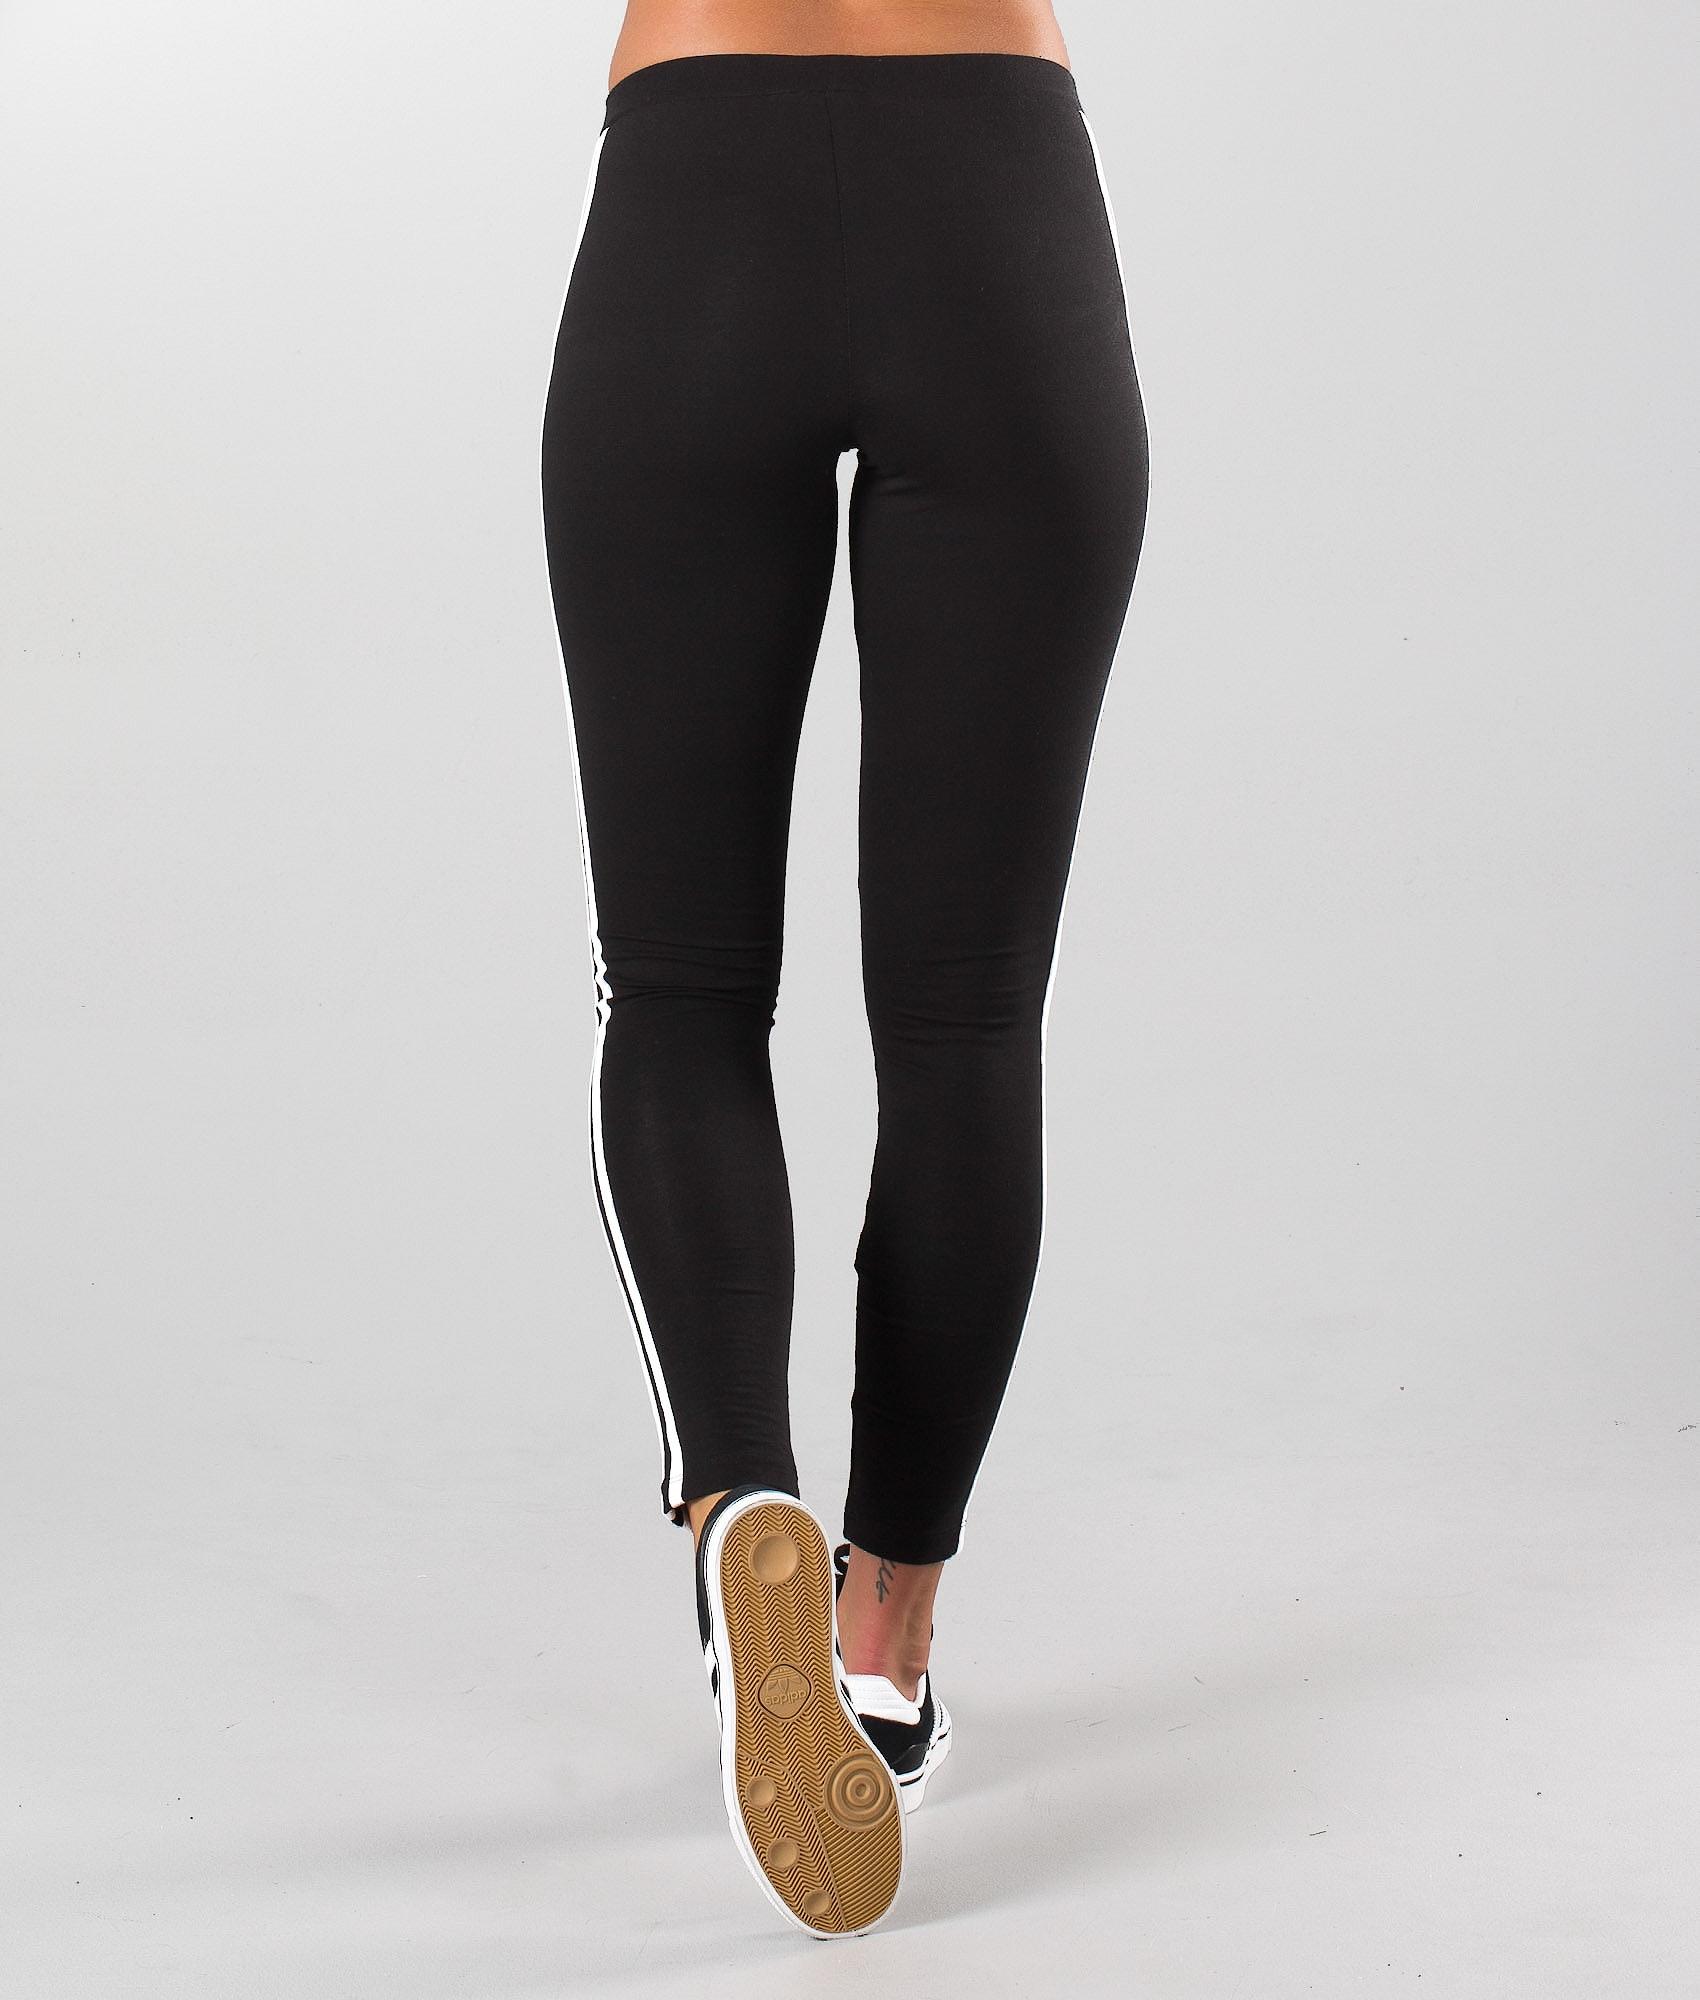 97fcc60693c8e Adidas Originals 3-Stripes Leggings Black